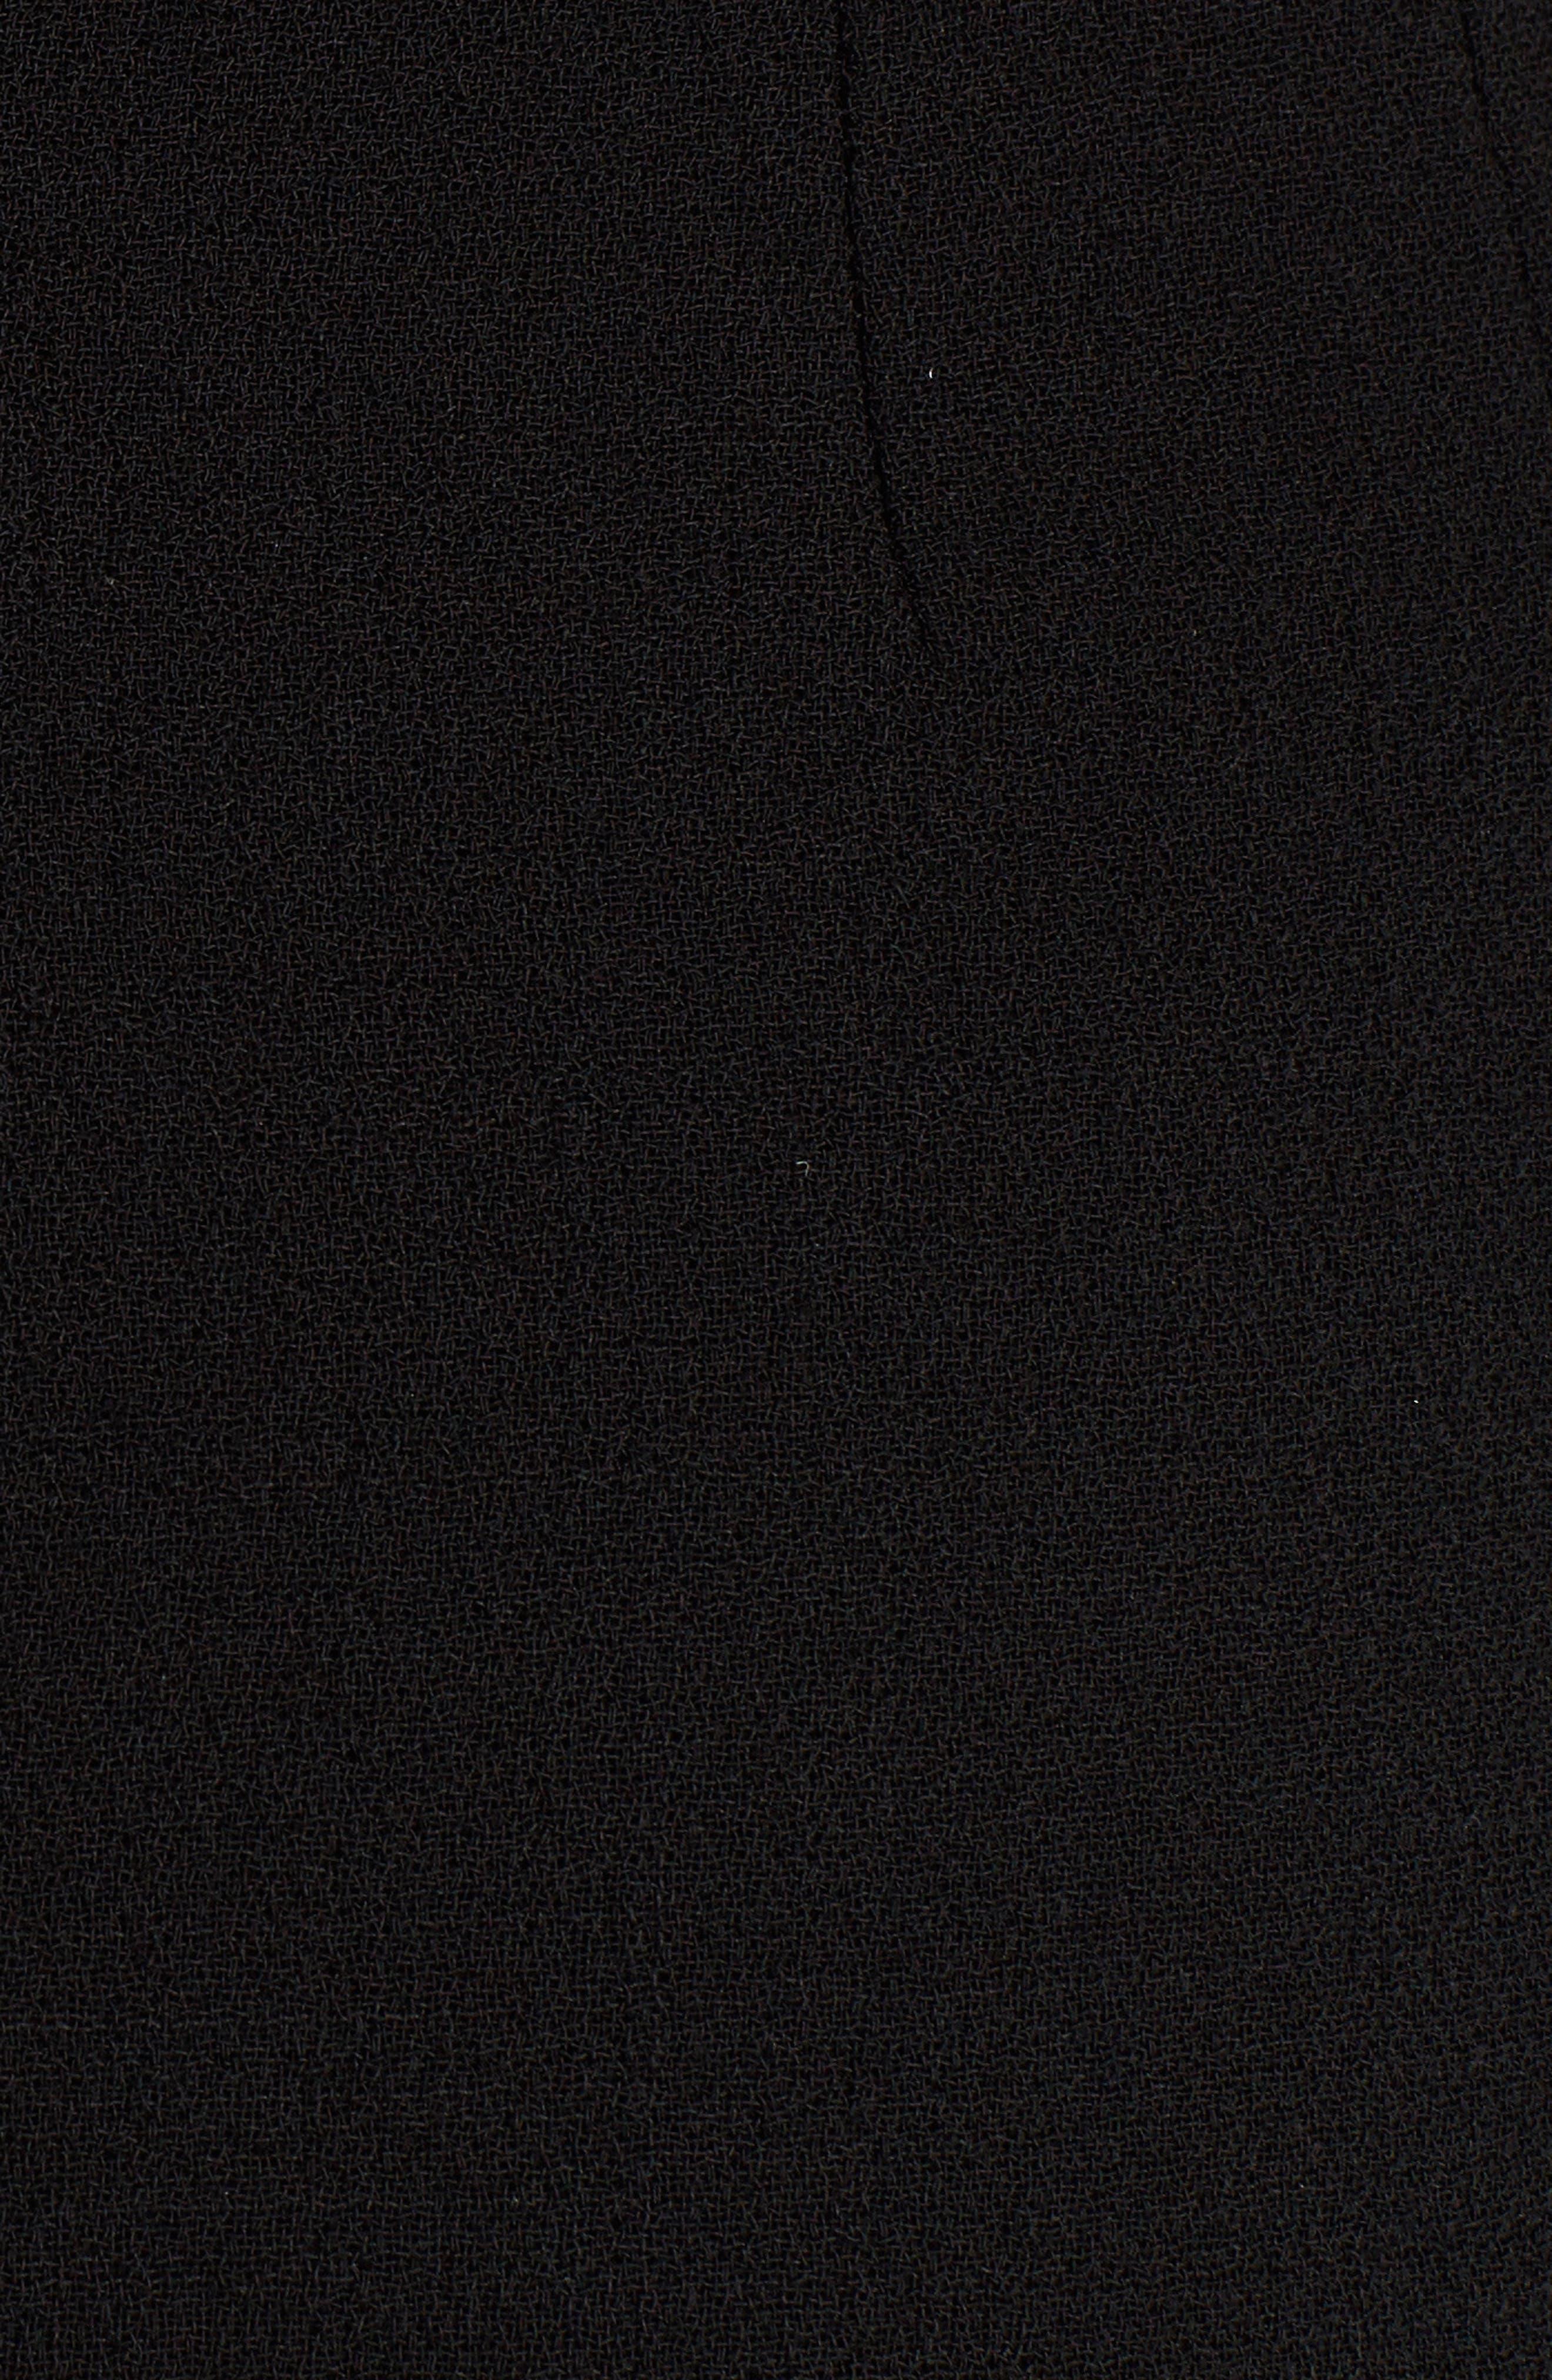 Button Detail Wool Crepe Dress,                             Alternate thumbnail 5, color,